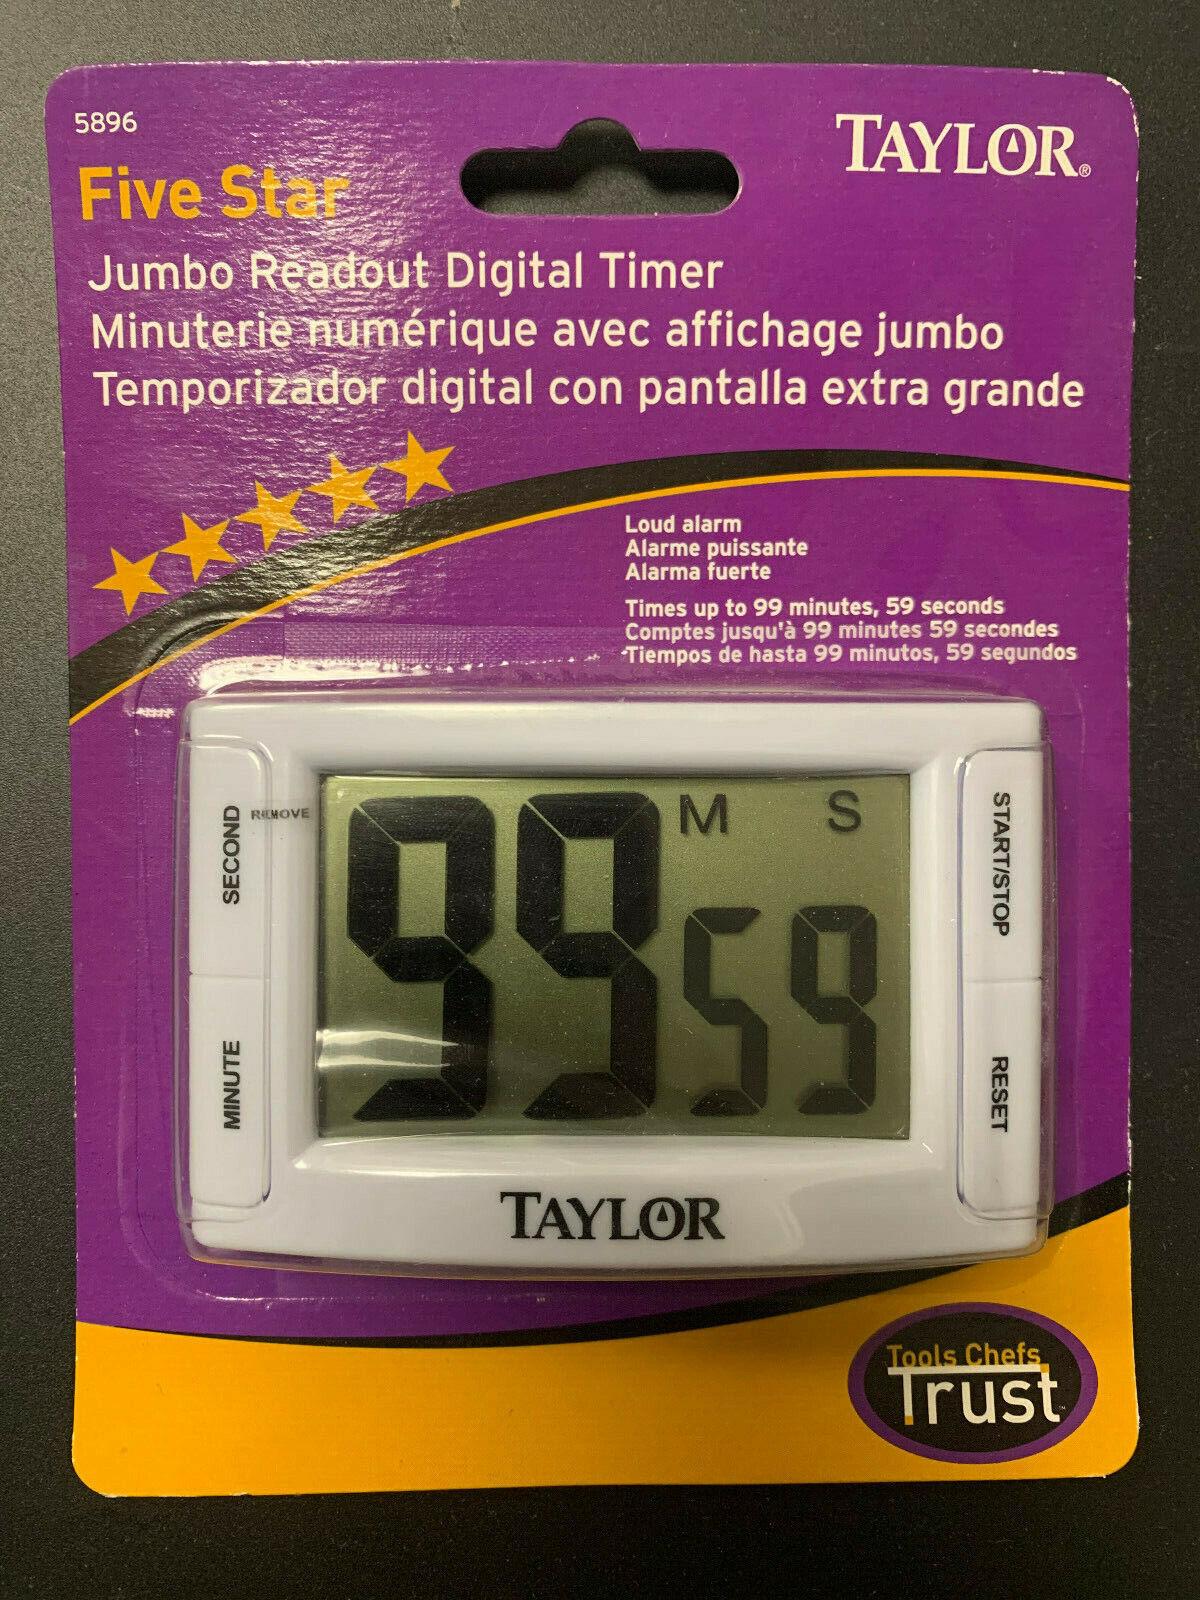 TAYLOR FIVE STAR JUMBO READOUT DIGITAL TIMER ** BRAND NEW **